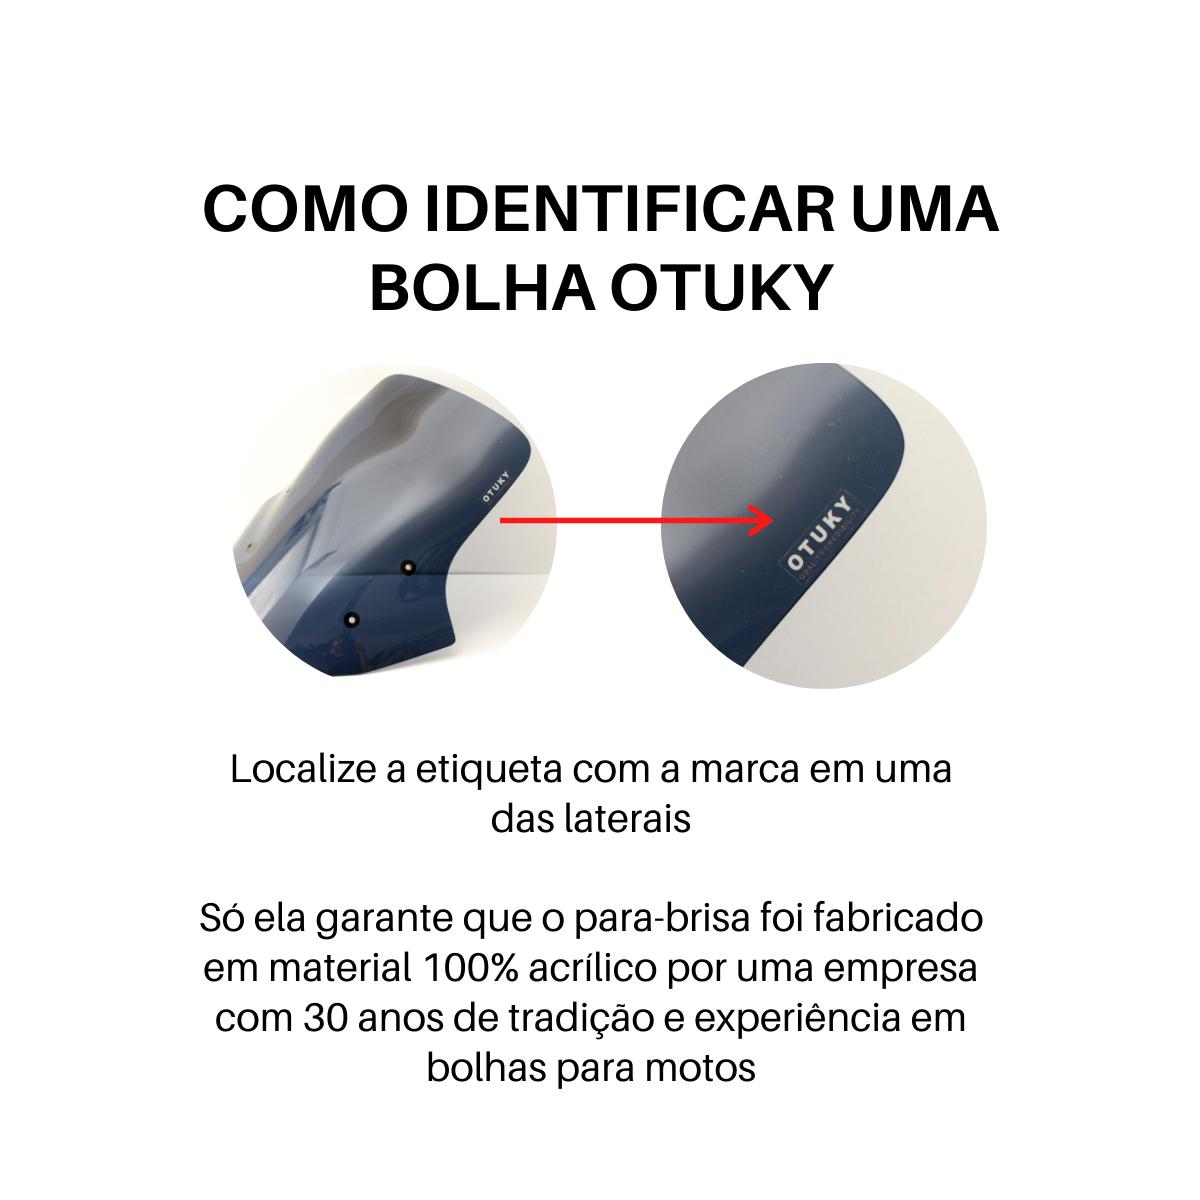 Bolha para Moto Srad 750 GSX-R 2014 2015 2016 Padrão Otuky